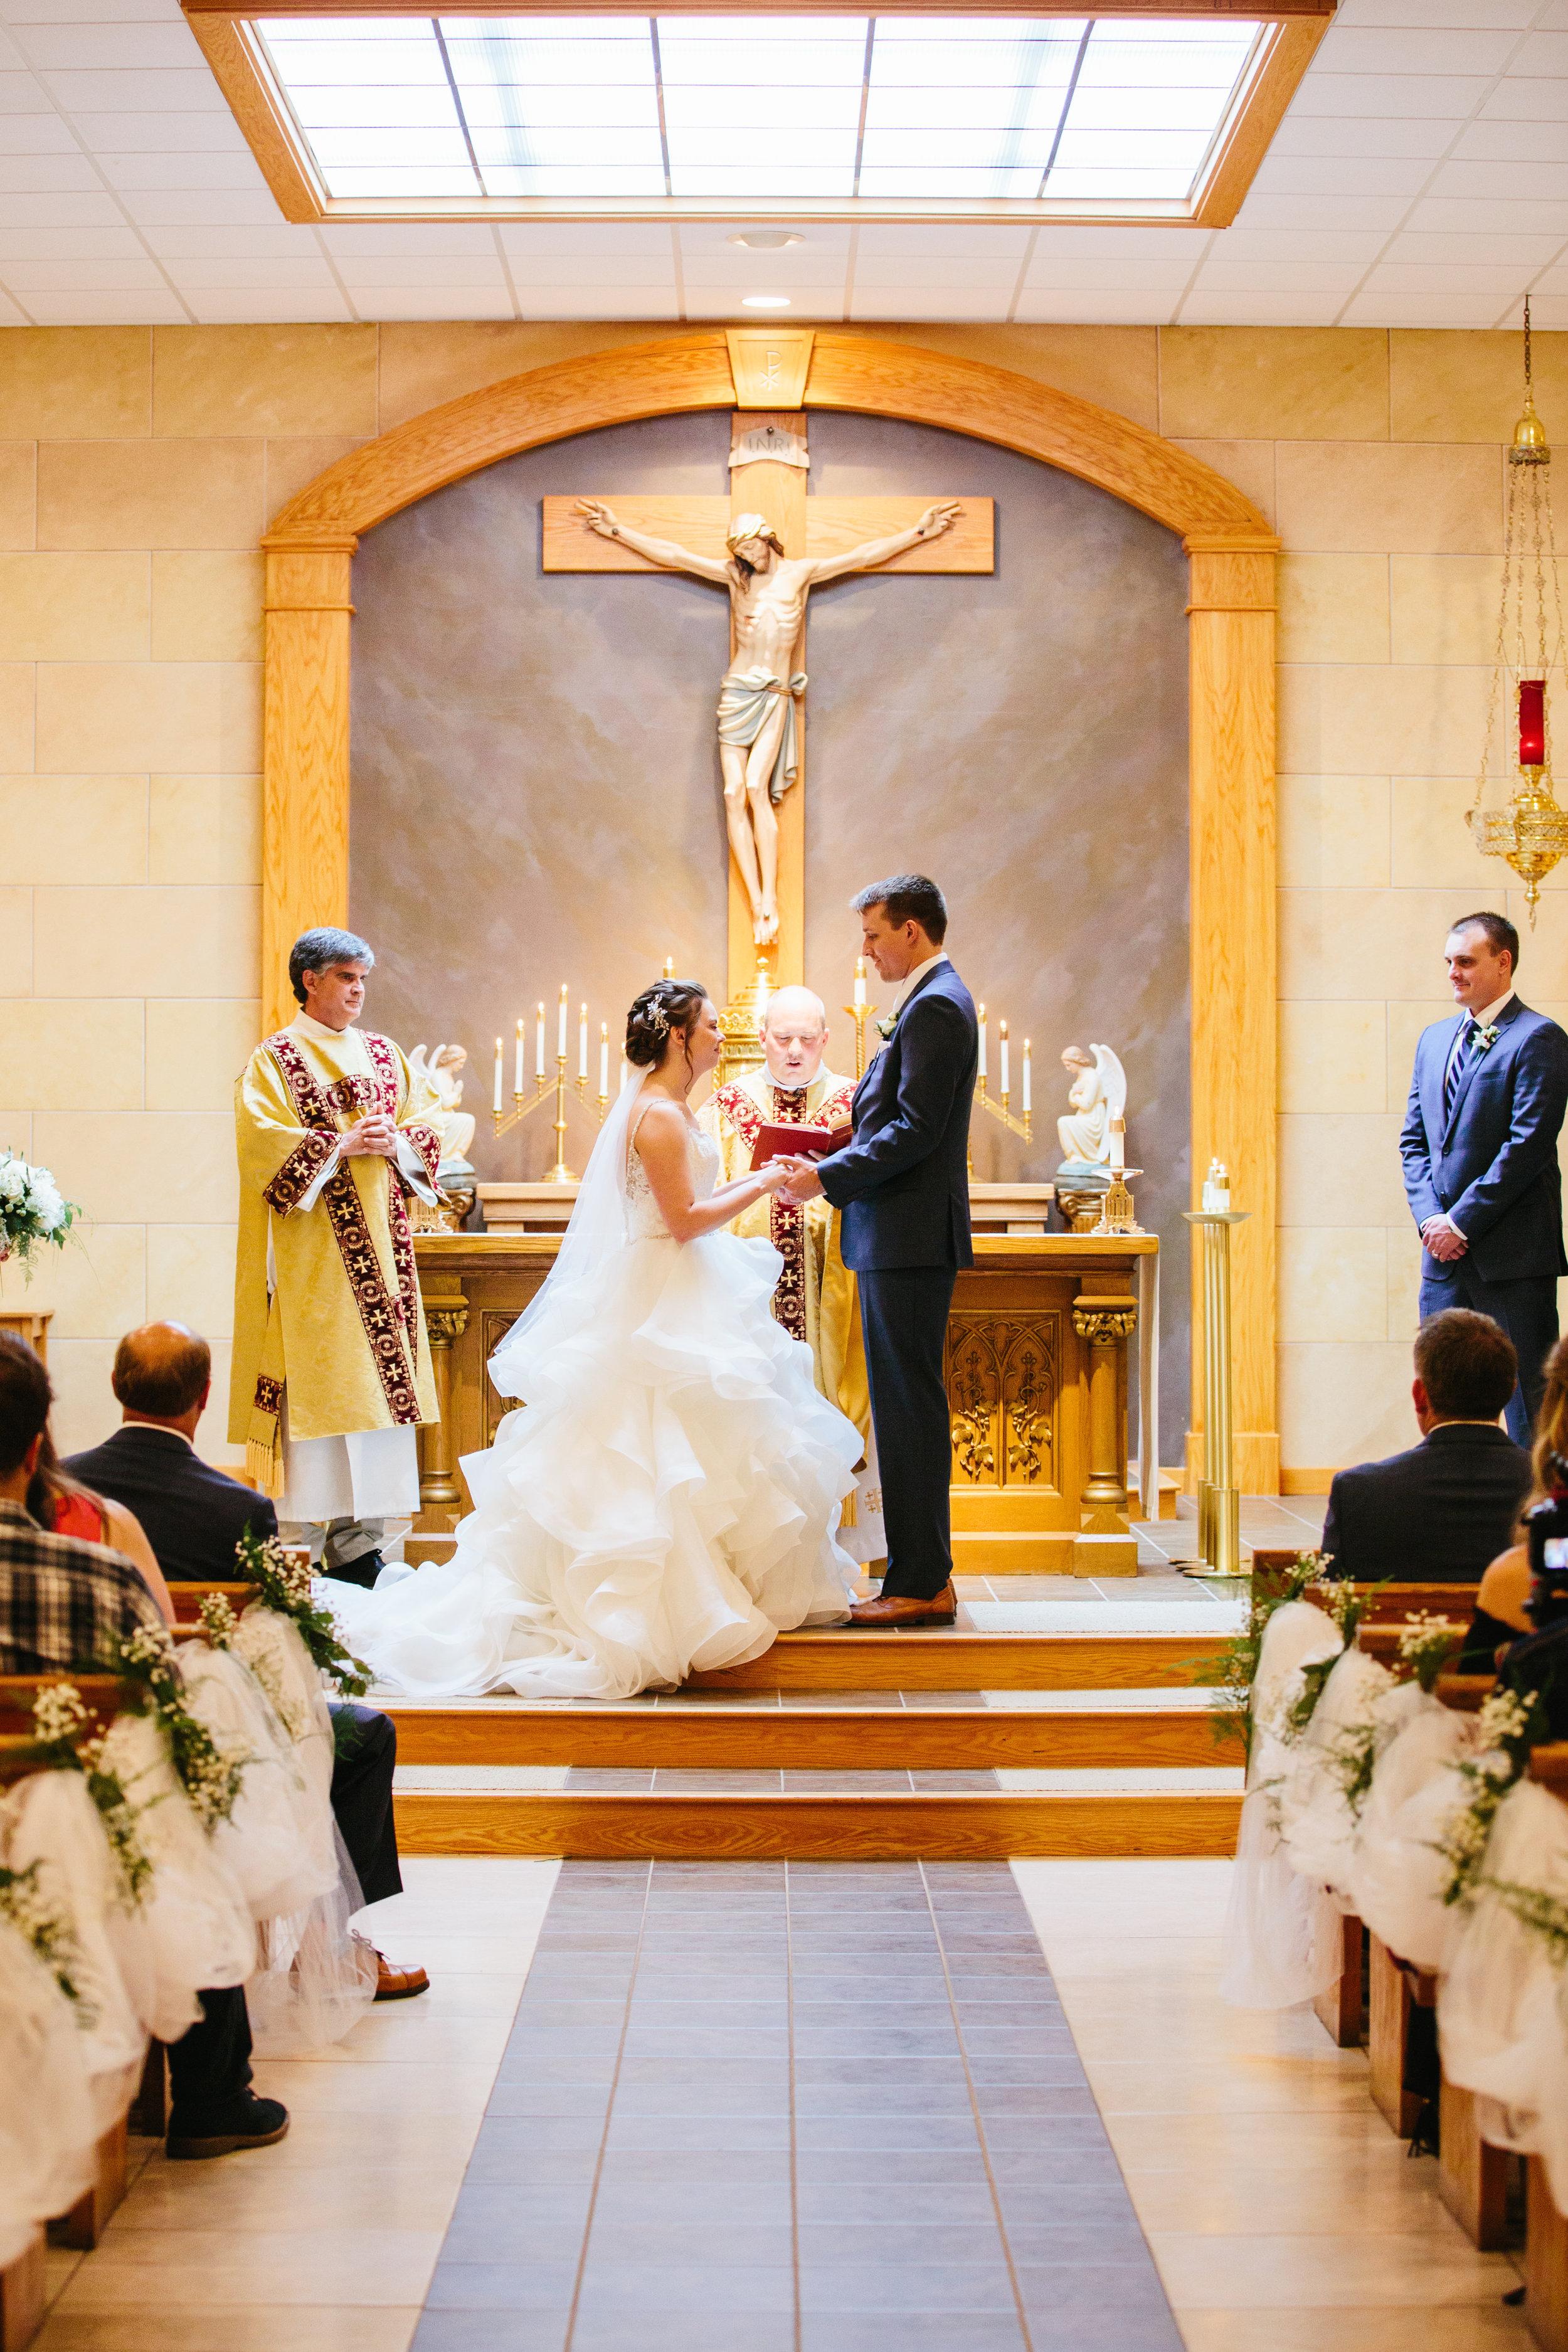 kristina_derek_ceremony-56.jpg